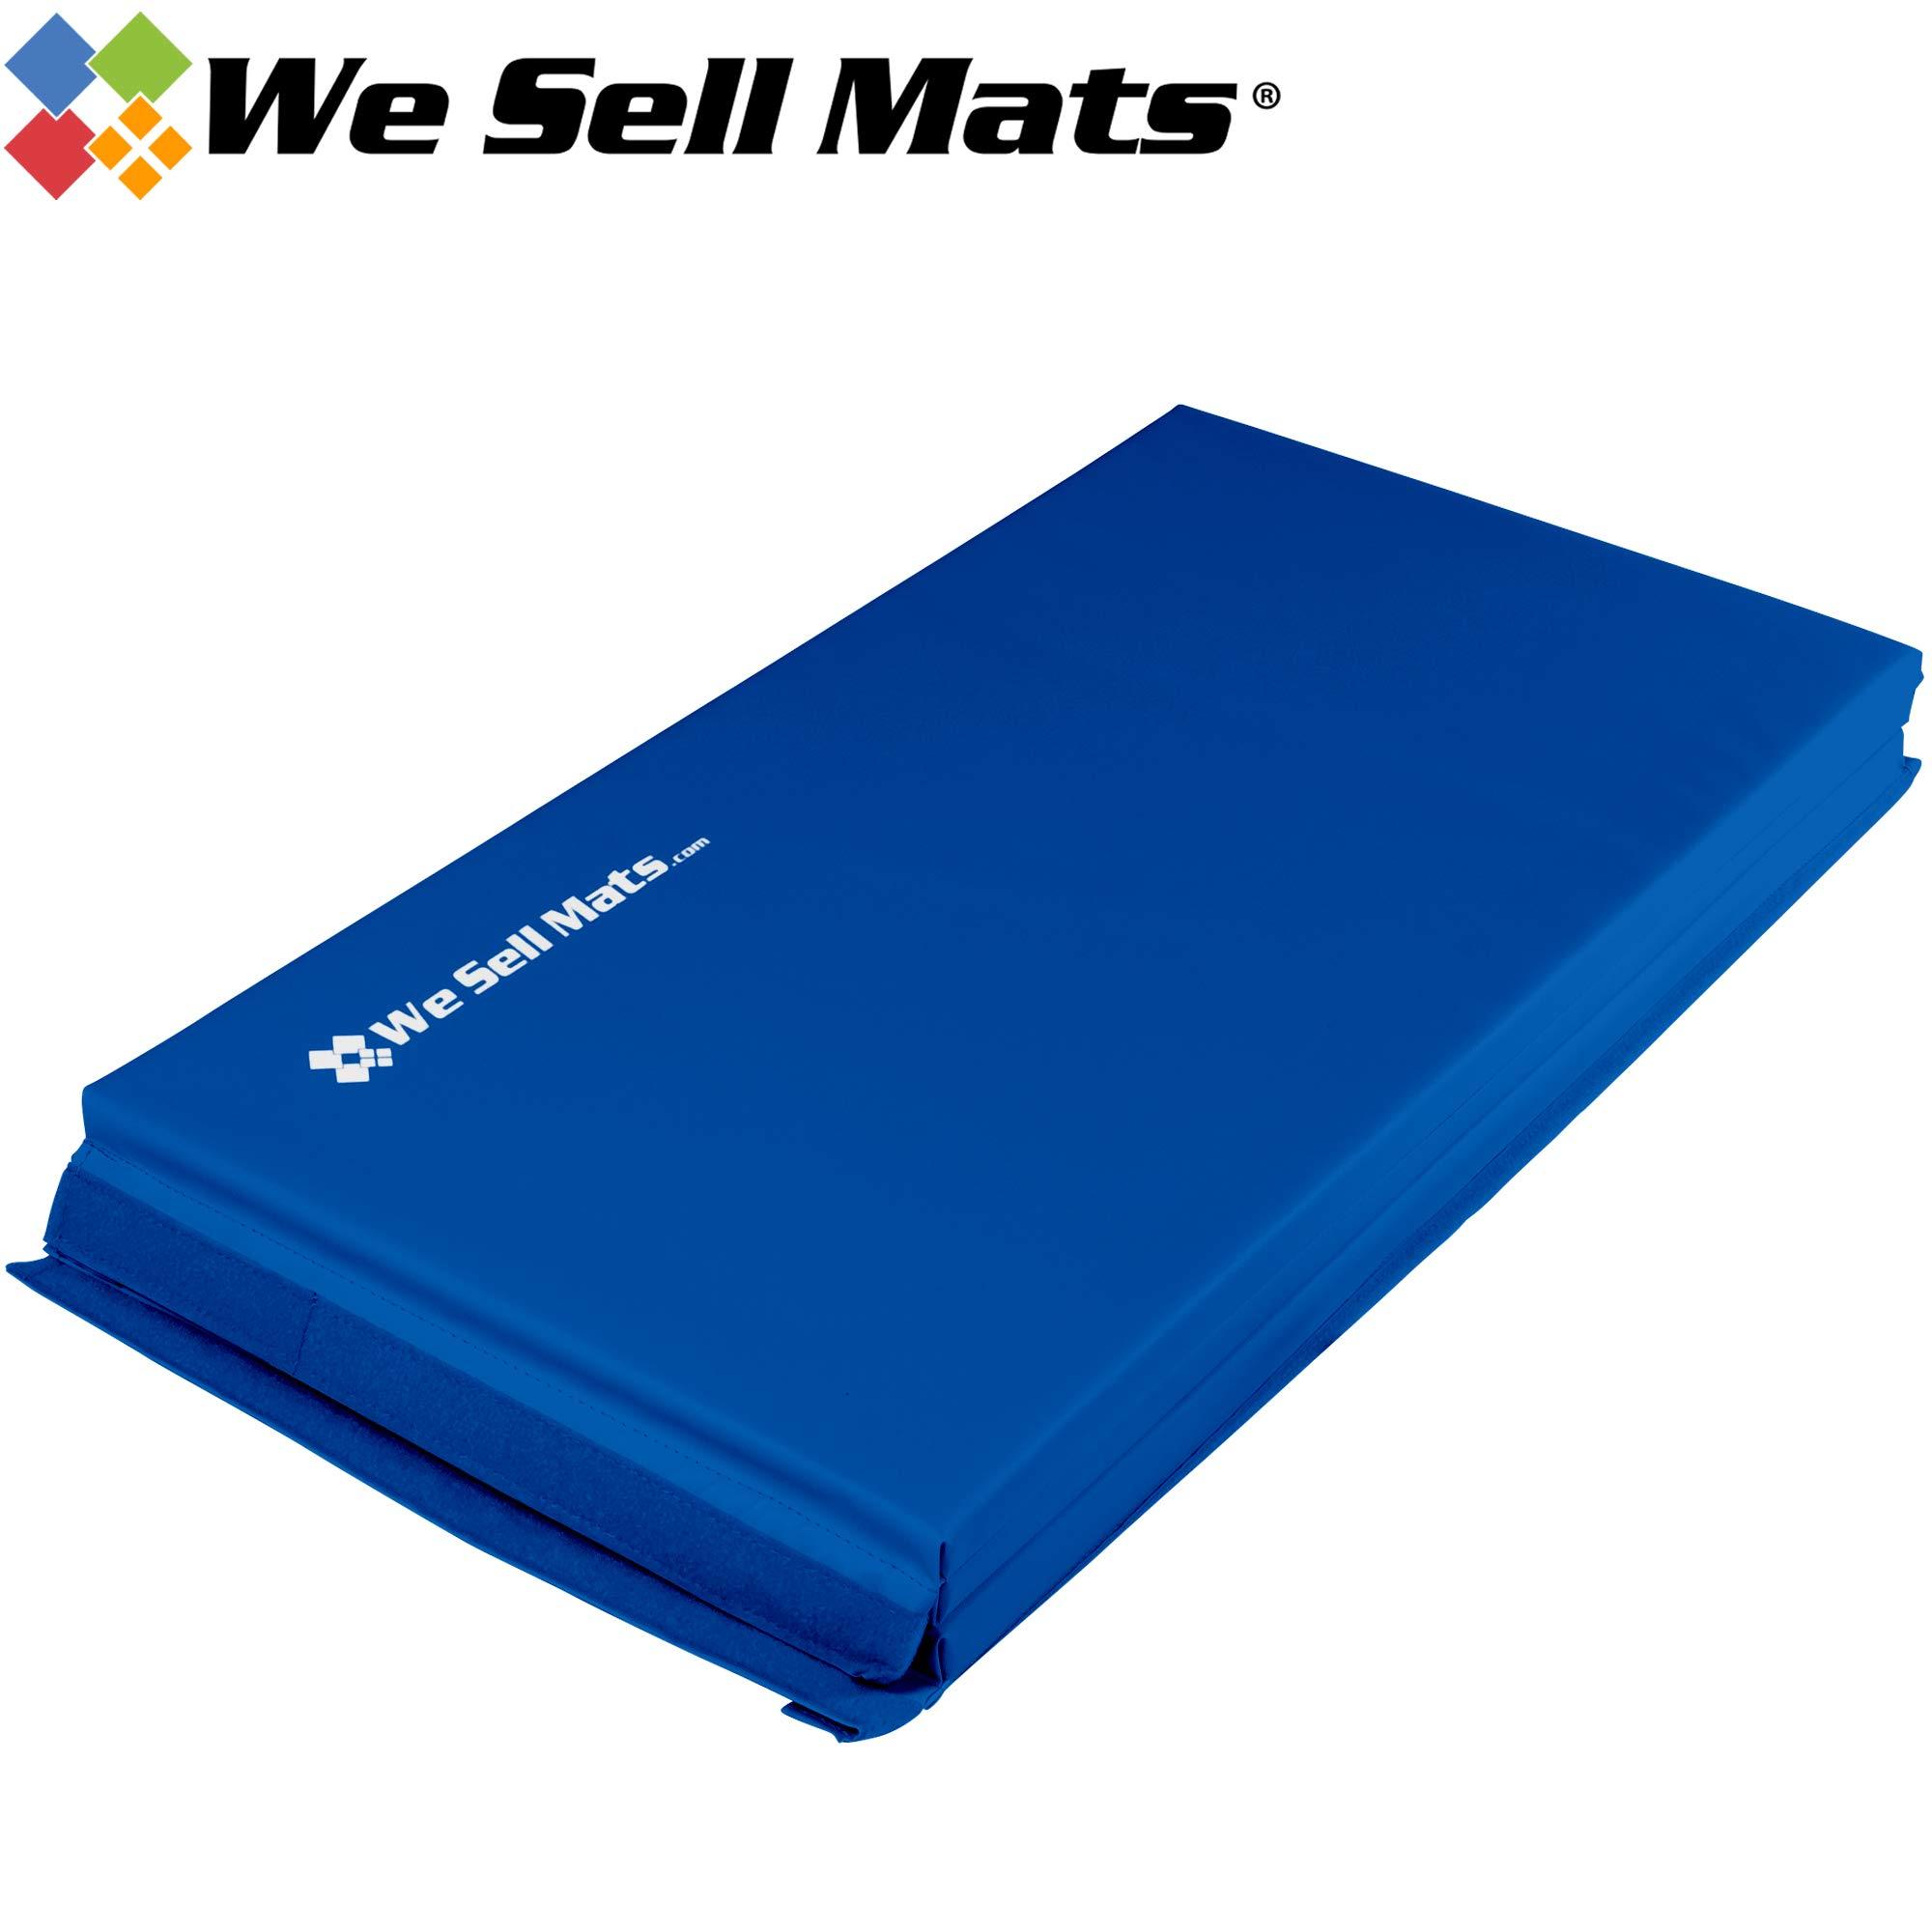 We Sell Mats Thick Gymnastics Tumbling Exercise Folding Mat, Blue, 4' x 6' x 1.5''